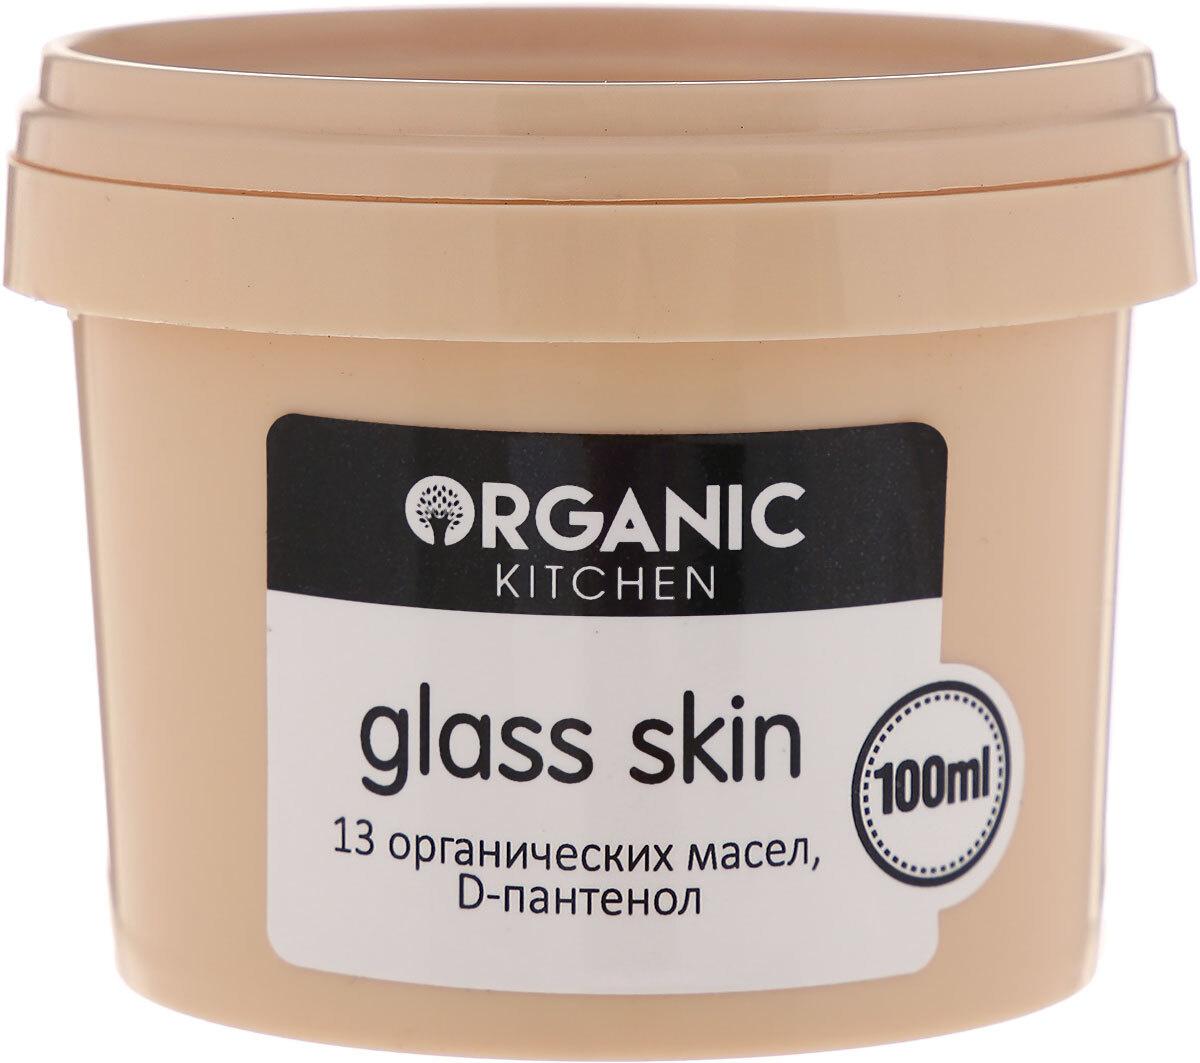 "Крем для ухода и макияжа Organic Shop Bloggers Kitchen ""Успокаивающий сияющий glass skin"", 5-в-1, от #1"